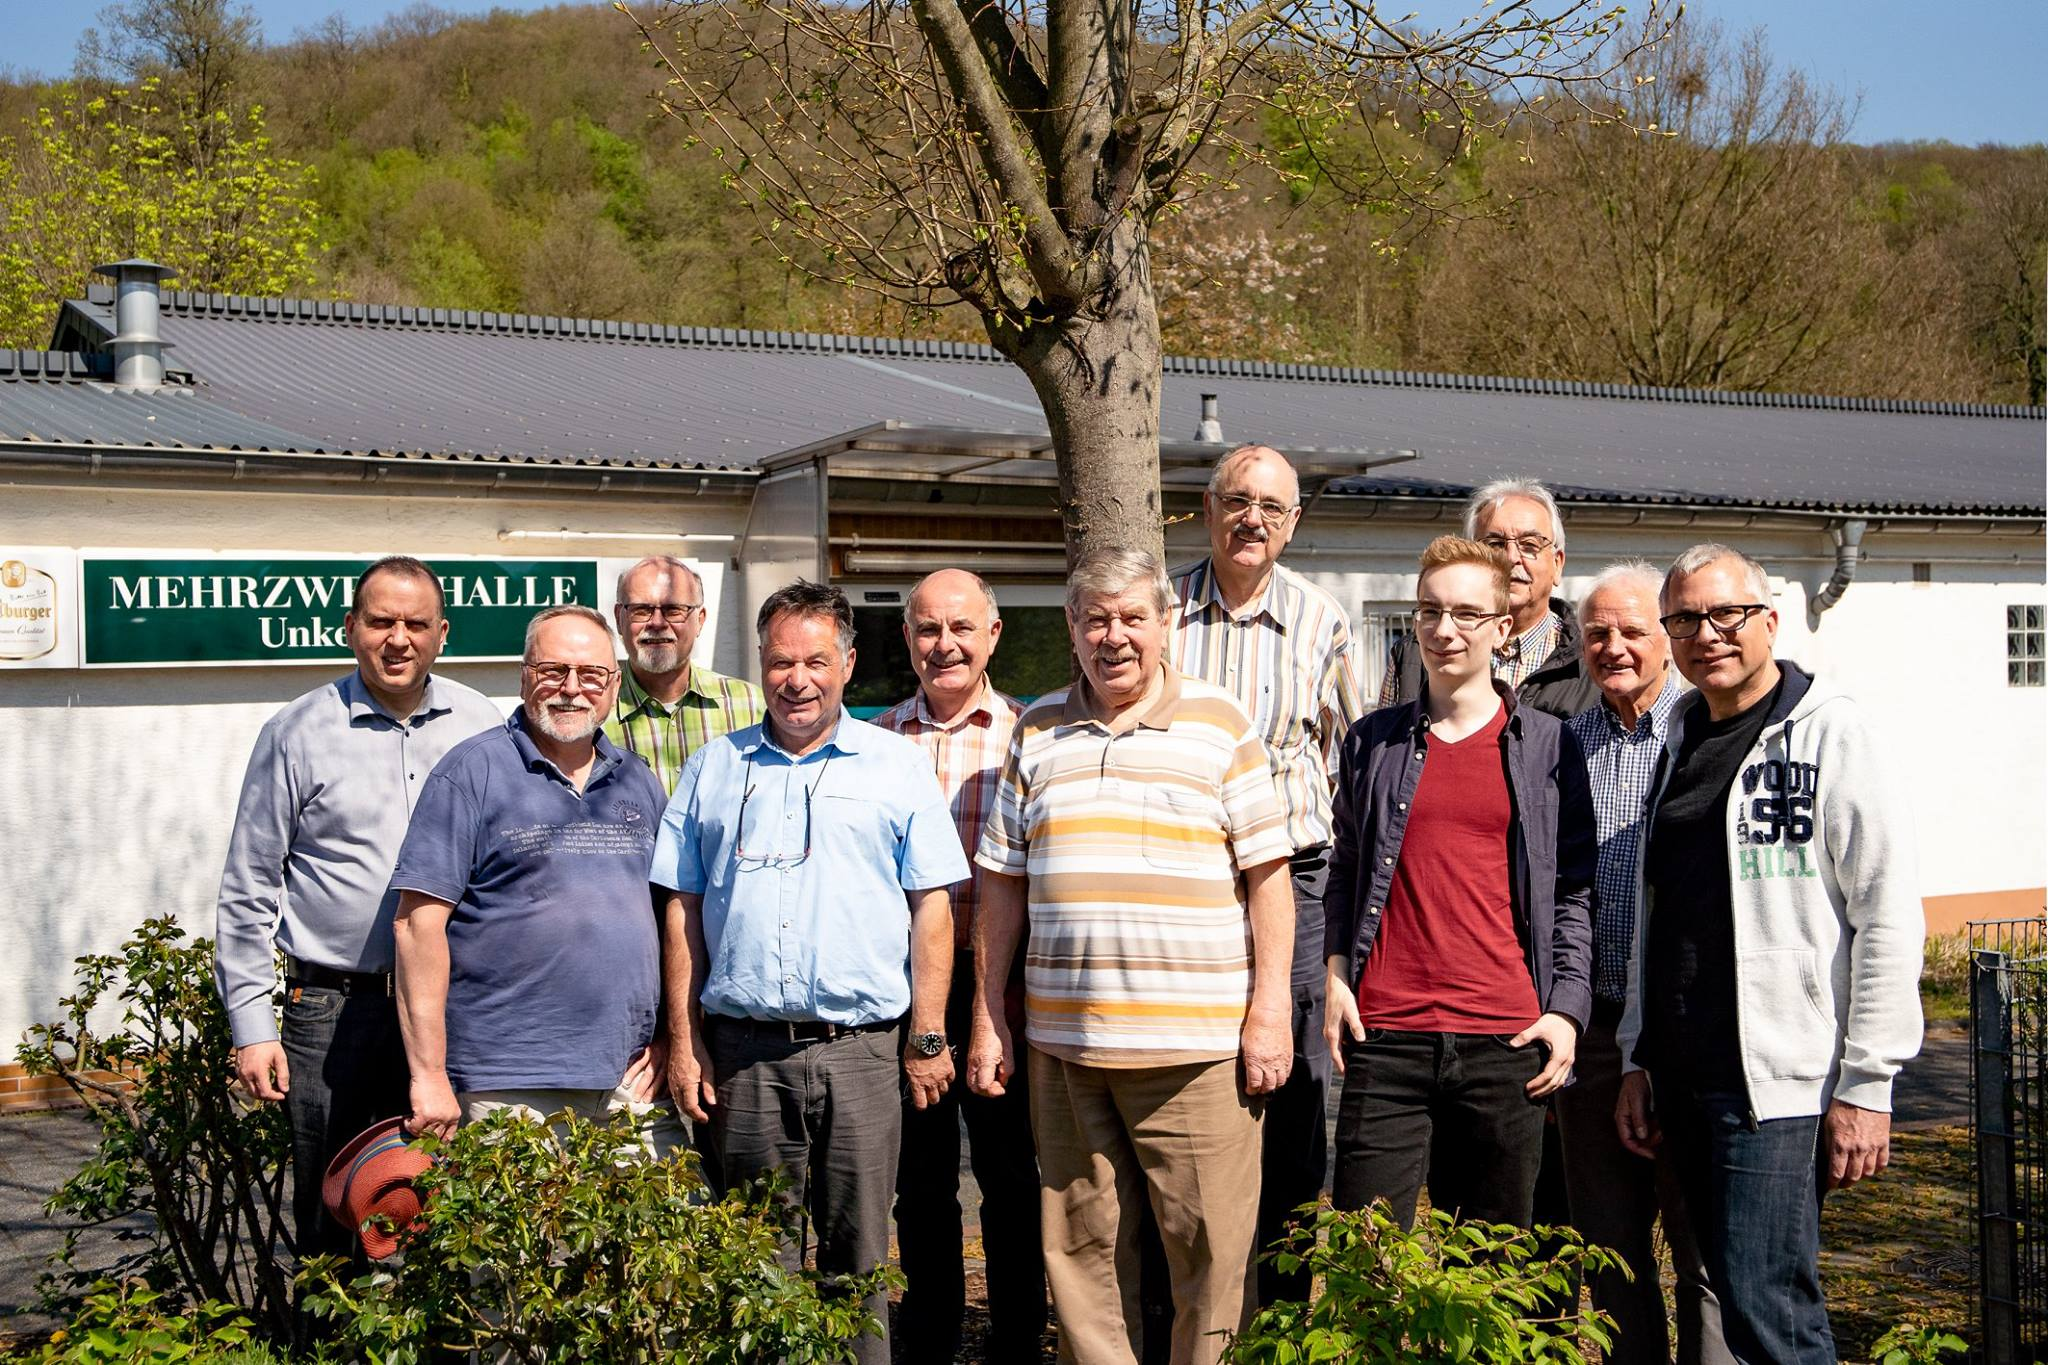 Kreis-FWG besucht Unkelbach – FBL-Kandidaten berichten über Maßnahmen gegen den Klimawandel